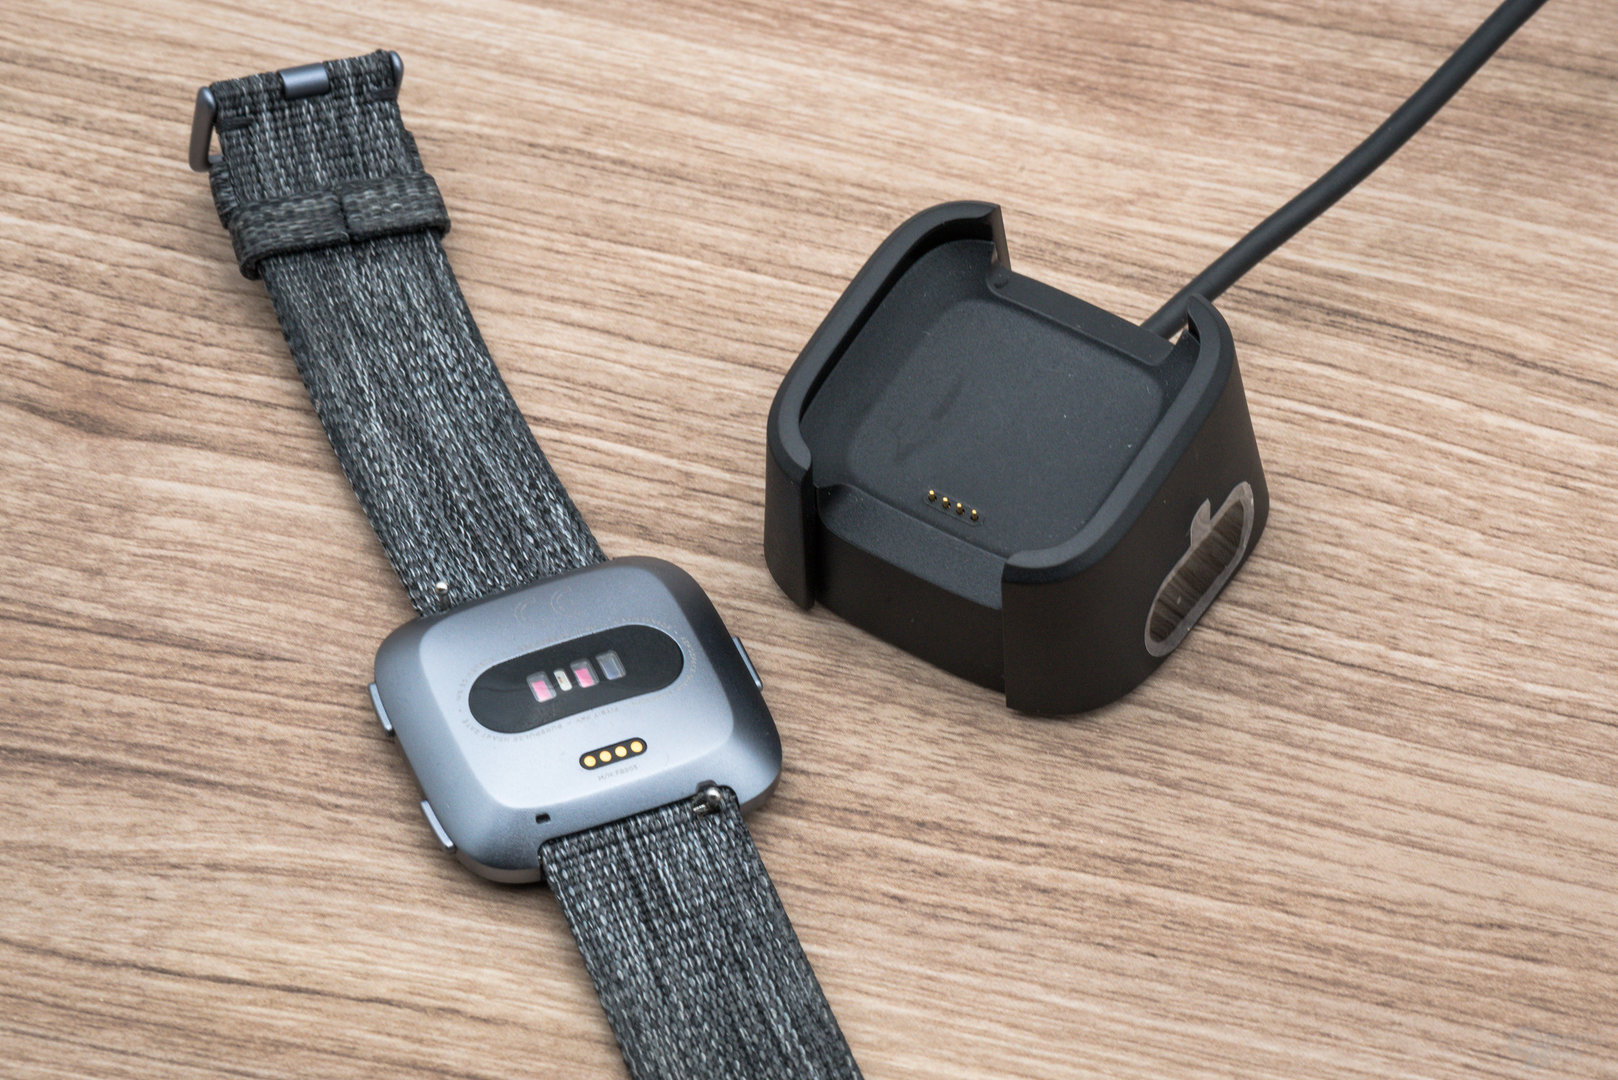 Fitbit Versa im Test: Ladekontakte